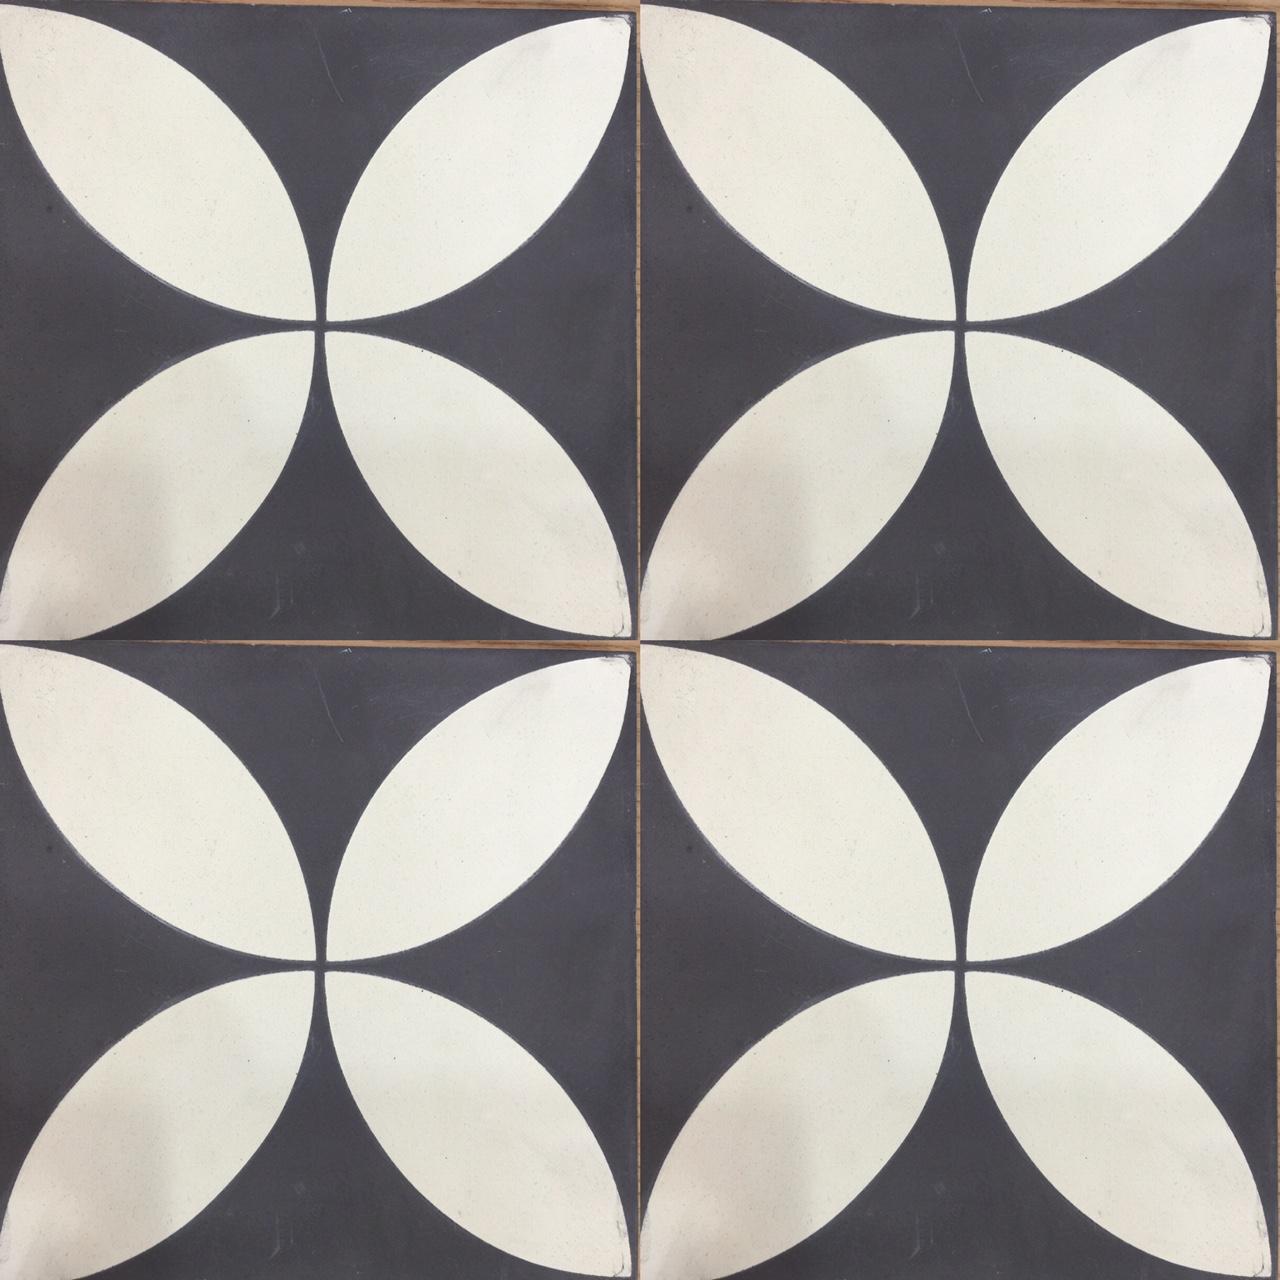 2 color 1 tile pattern